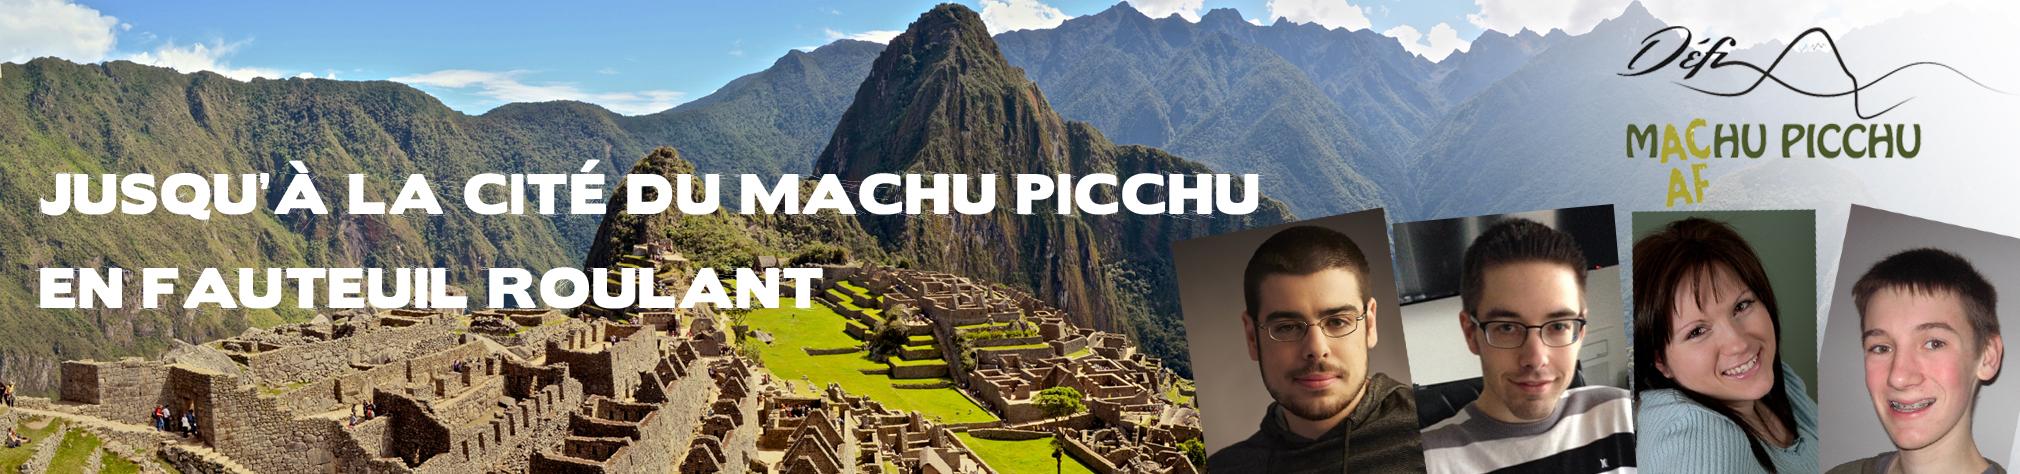 banner-machupicchu